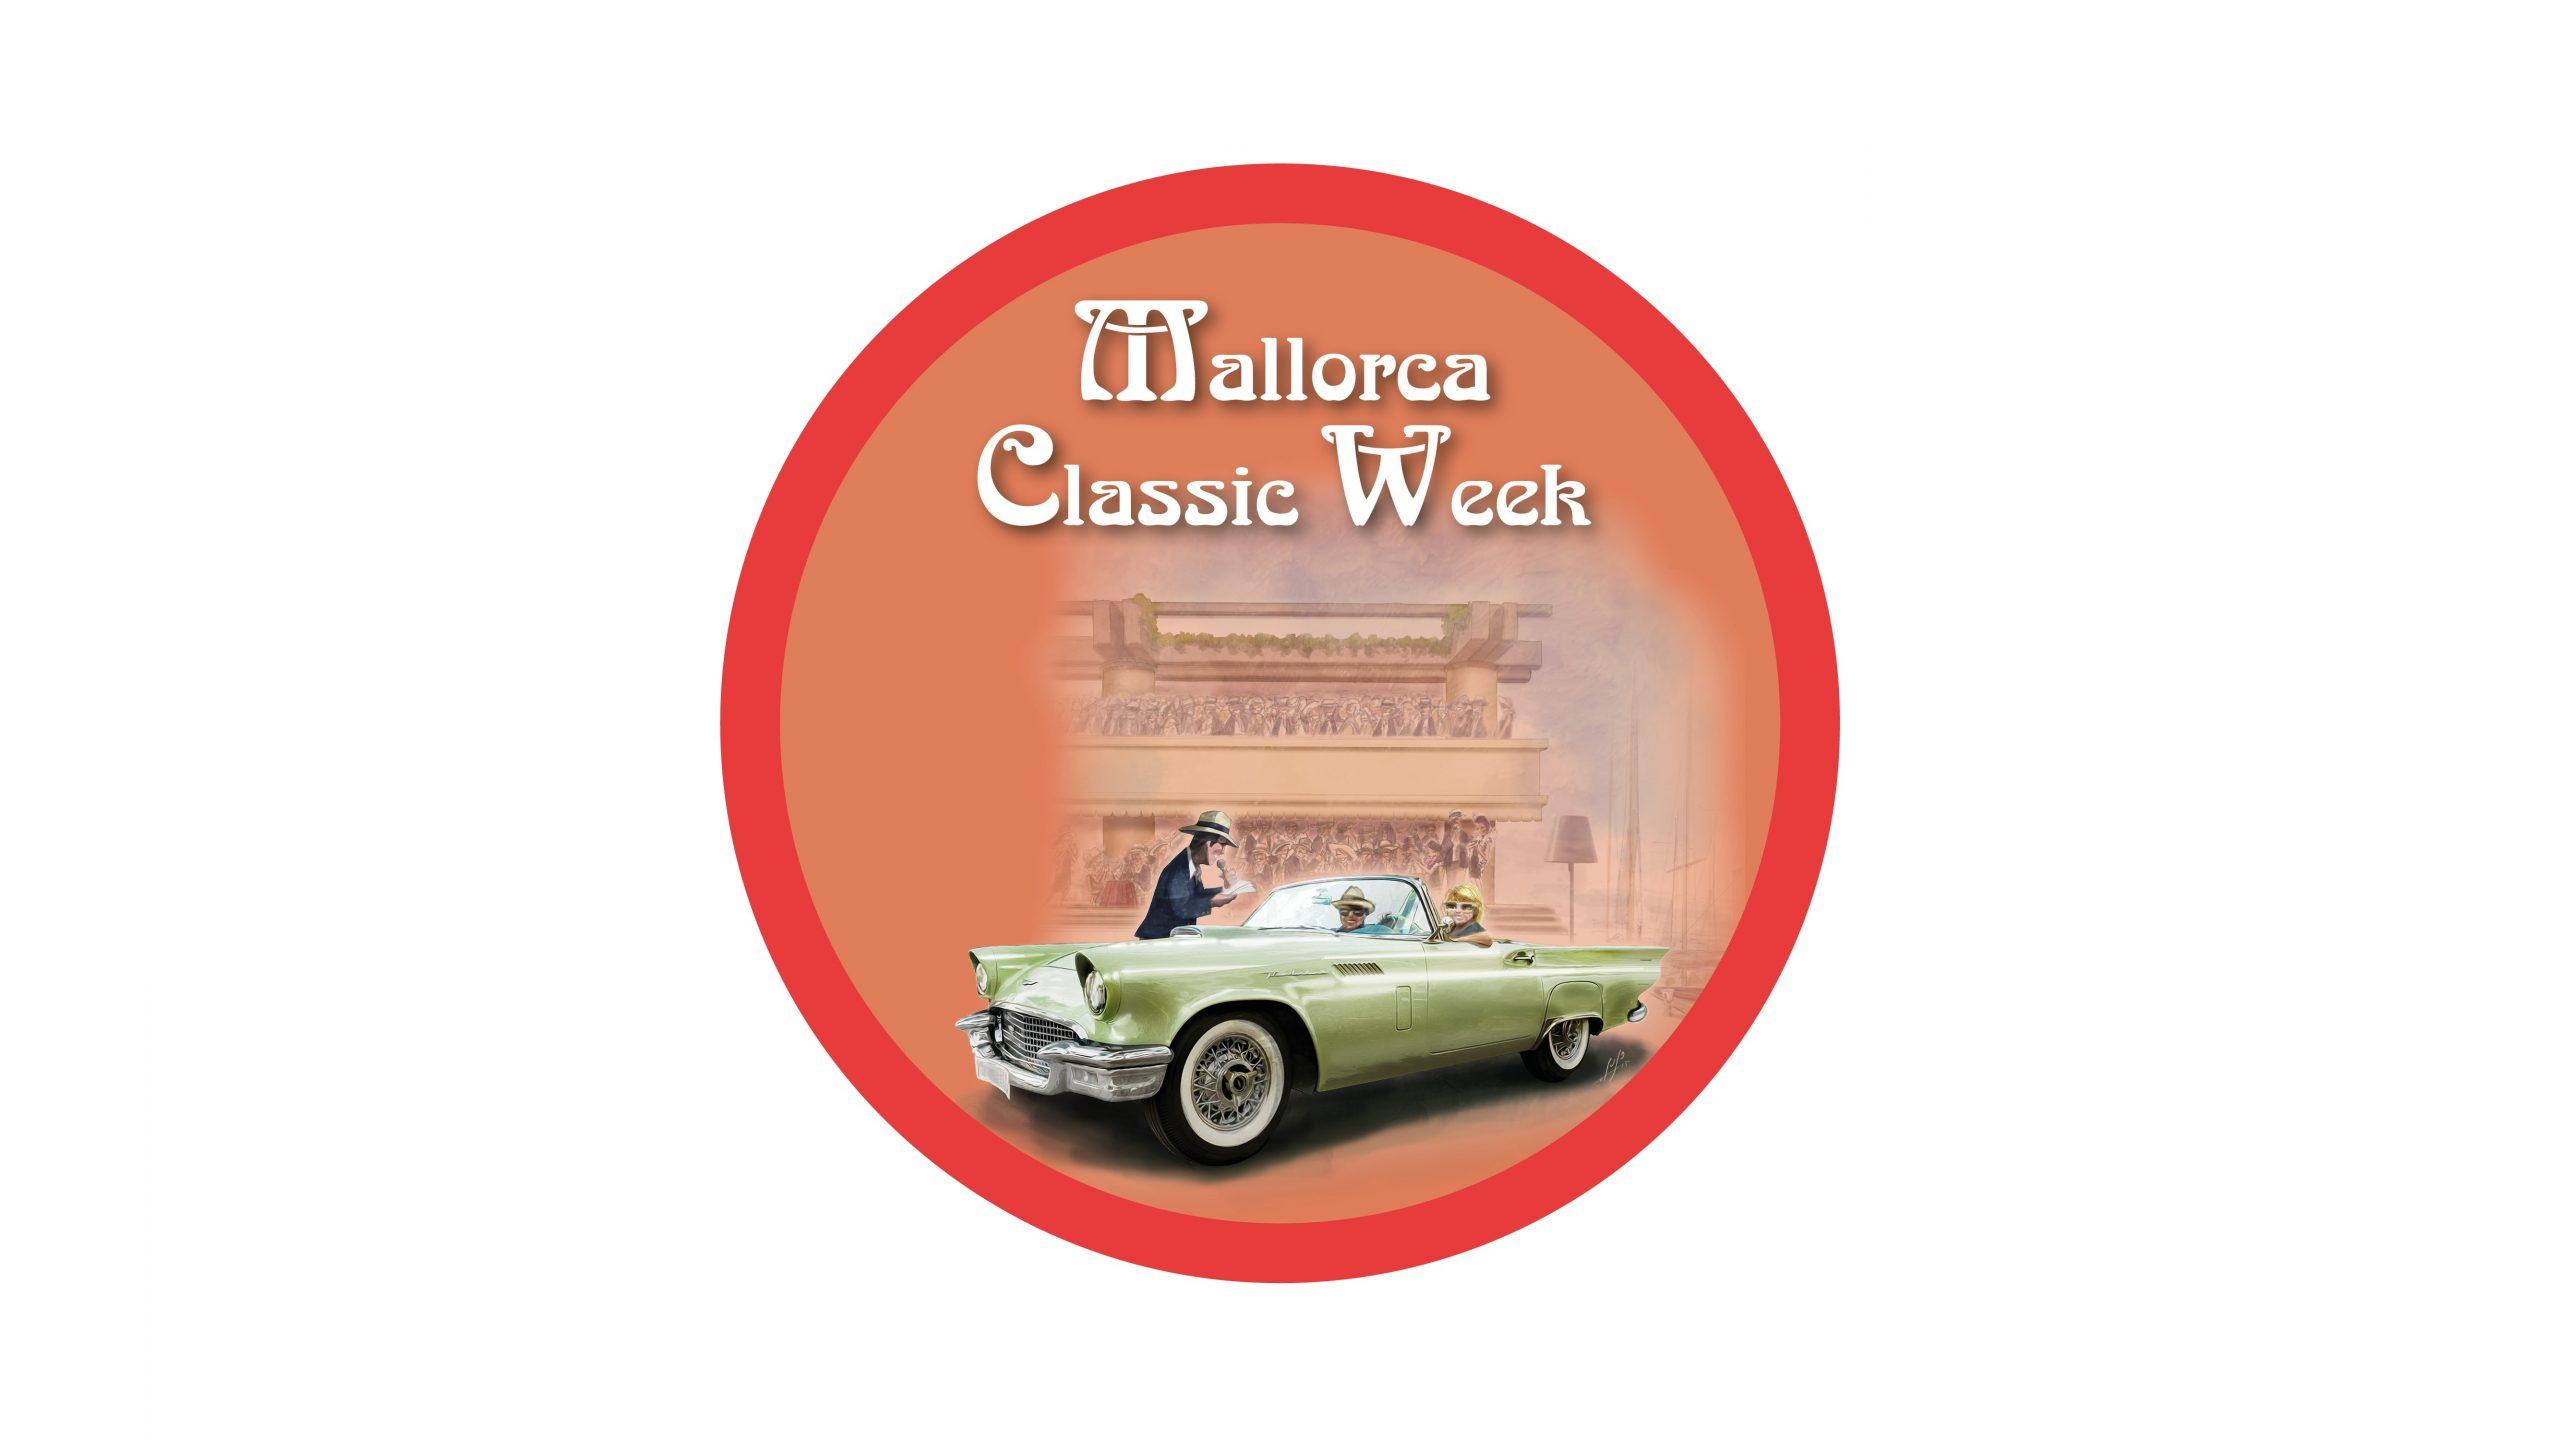 Mallorca Classic Week 2021